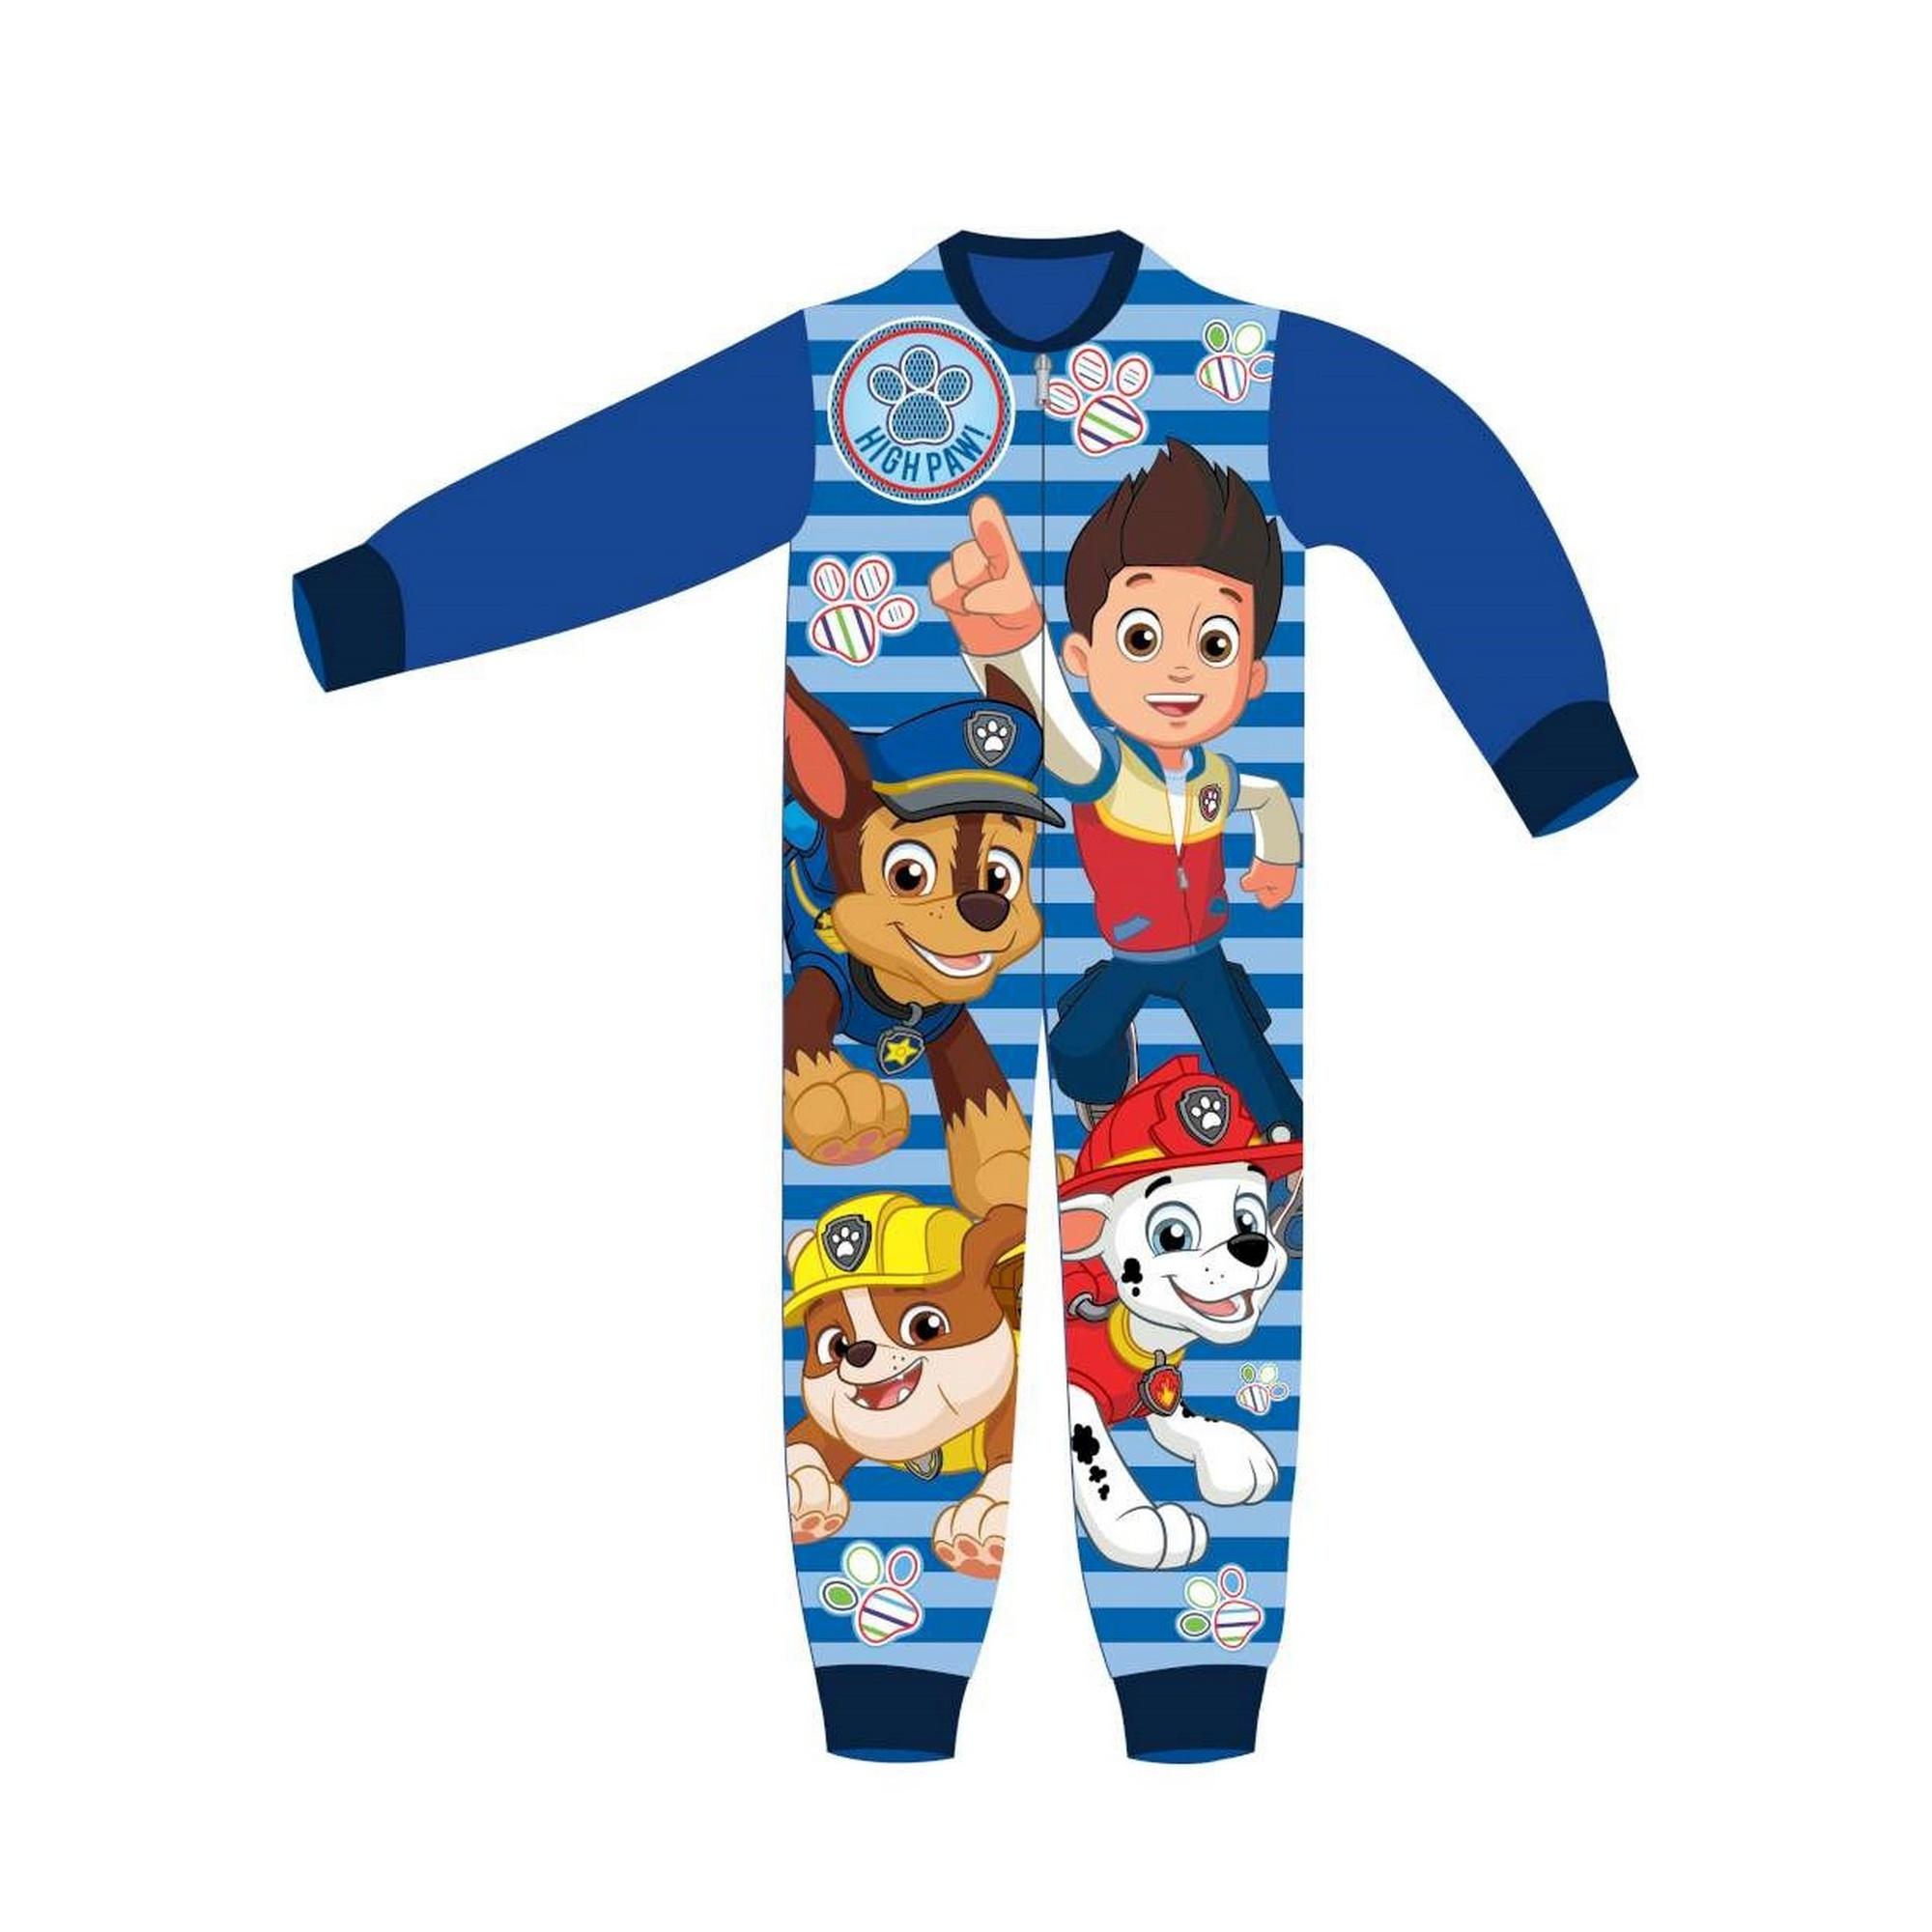 Paw-Patrol-Pijama-infantil-de-una-pieza-de-la-Patrulla-Canina-TF575